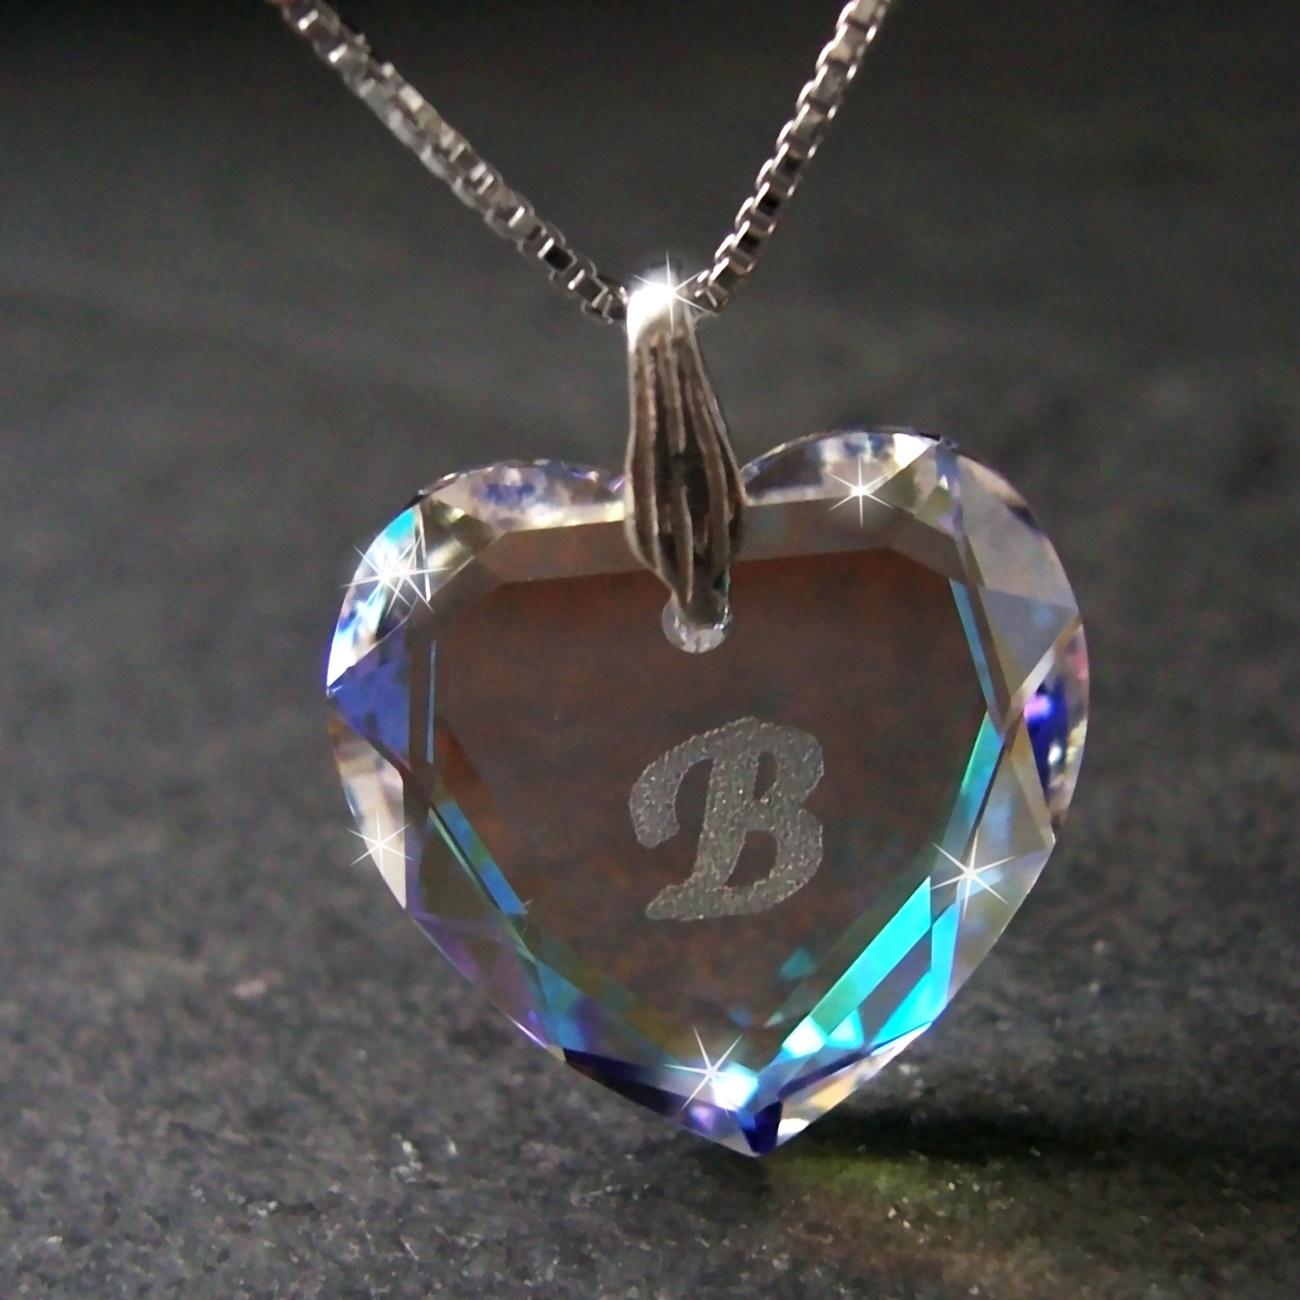 Kette 925 Silber Venezia 45cm Herz Swarovski Kristall BlueAB 1631245-B